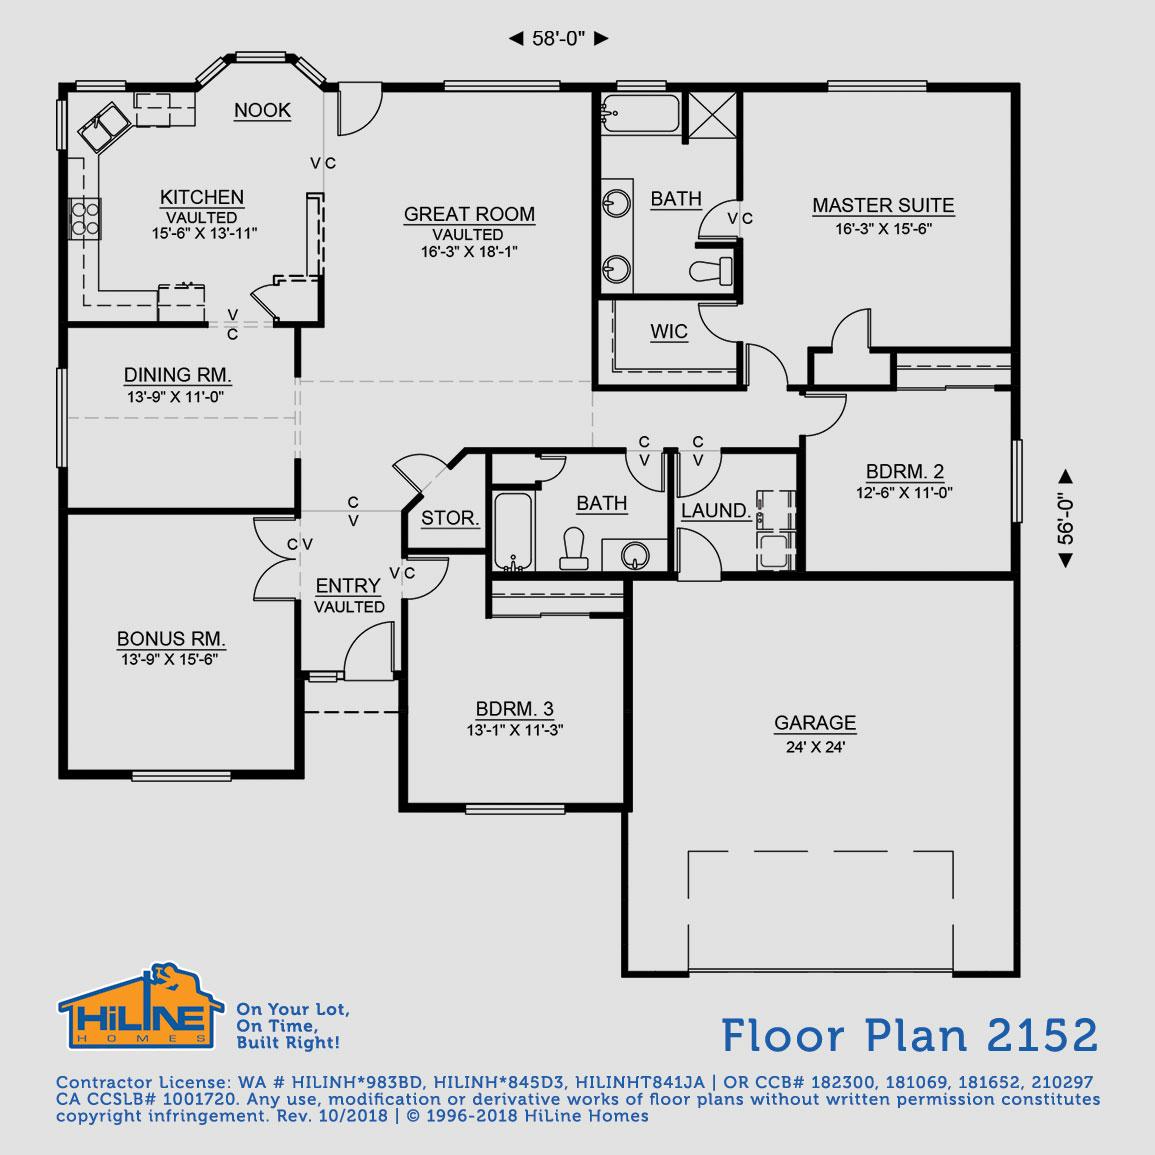 Floorplan 2152 hiline homes for Hiline homes floor plans